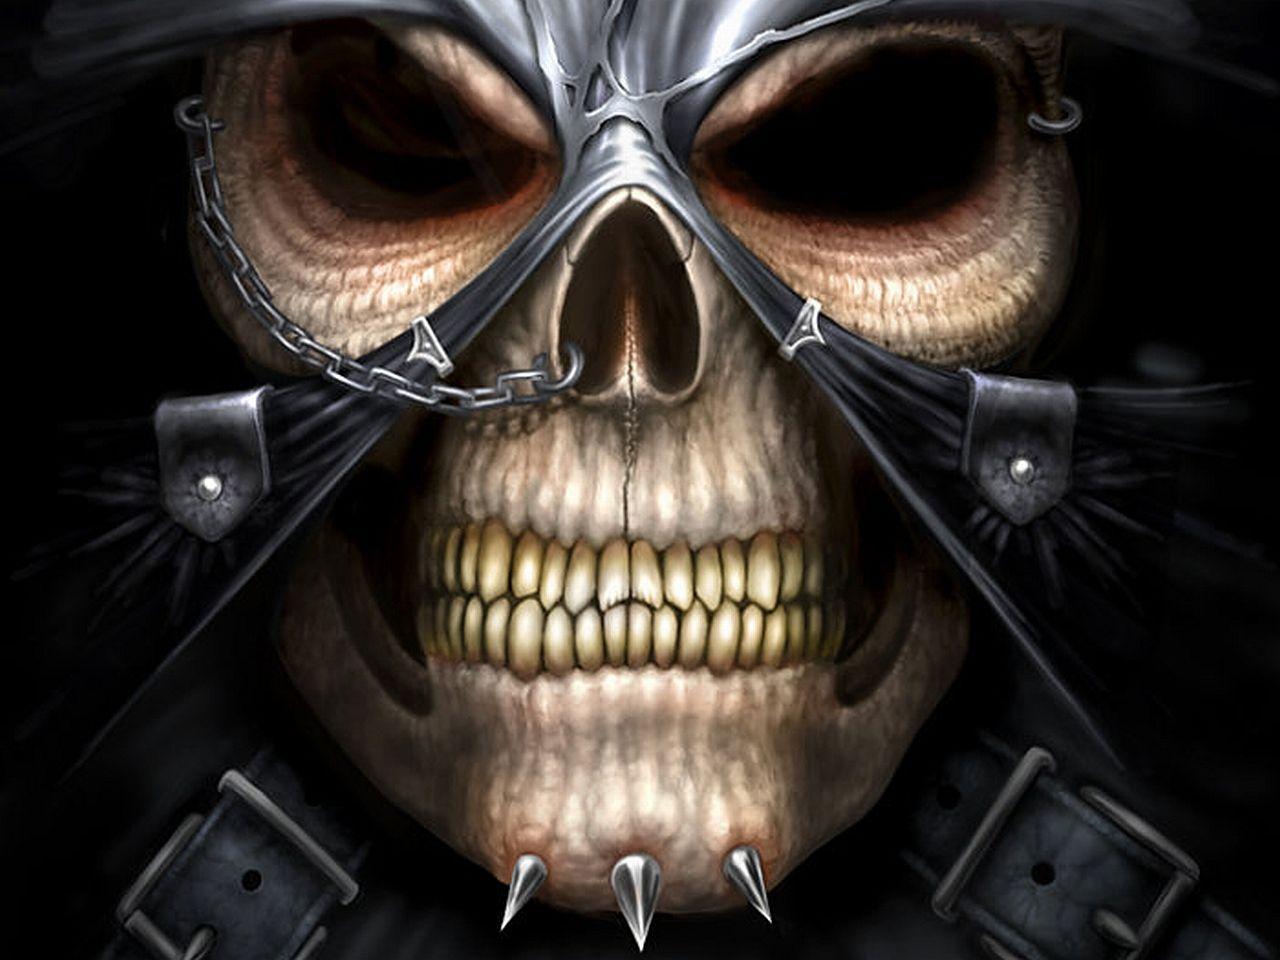 Scary skulls images evil skull wallpaper categories - Scary skull backgrounds ...